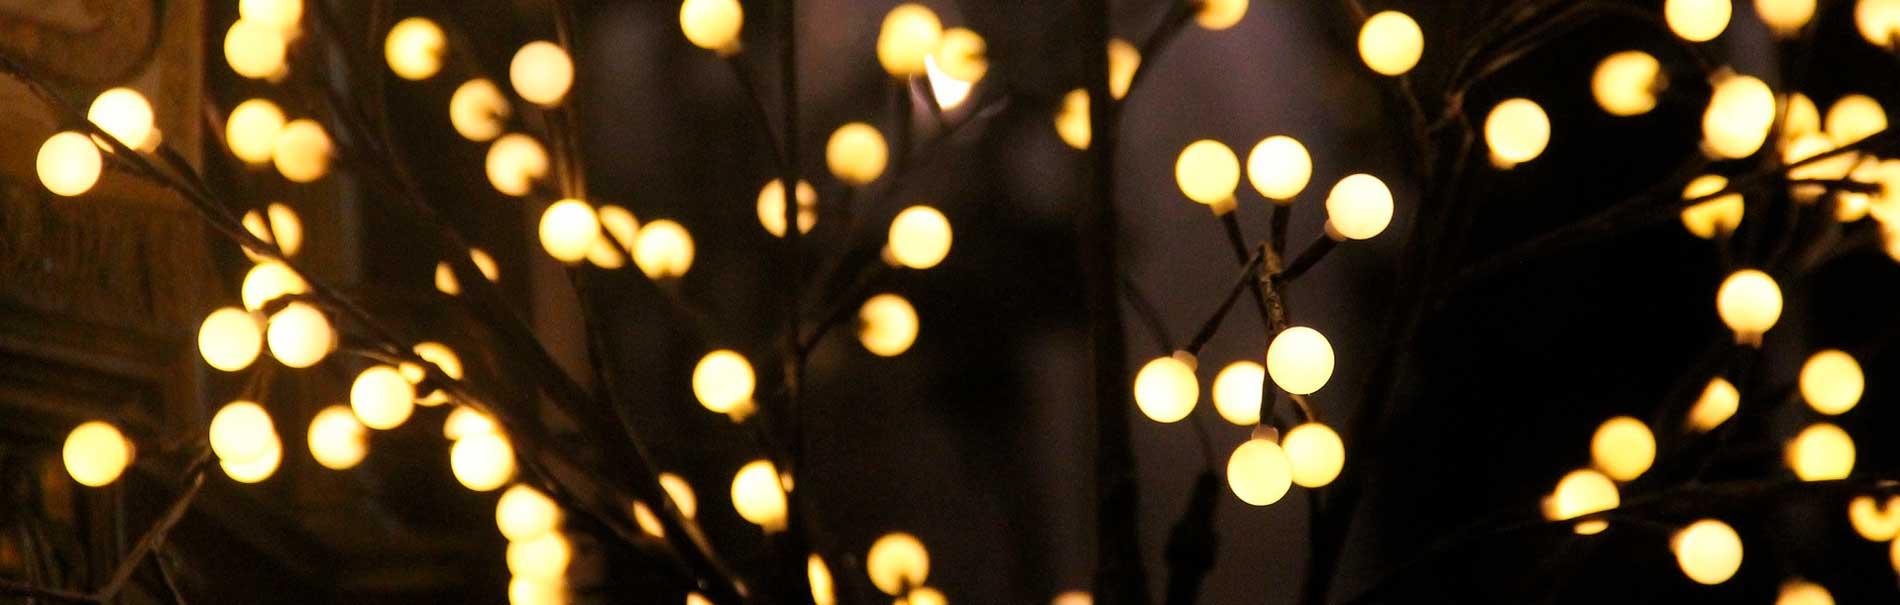 Las cinco mejores luces de guirnalda para exterior